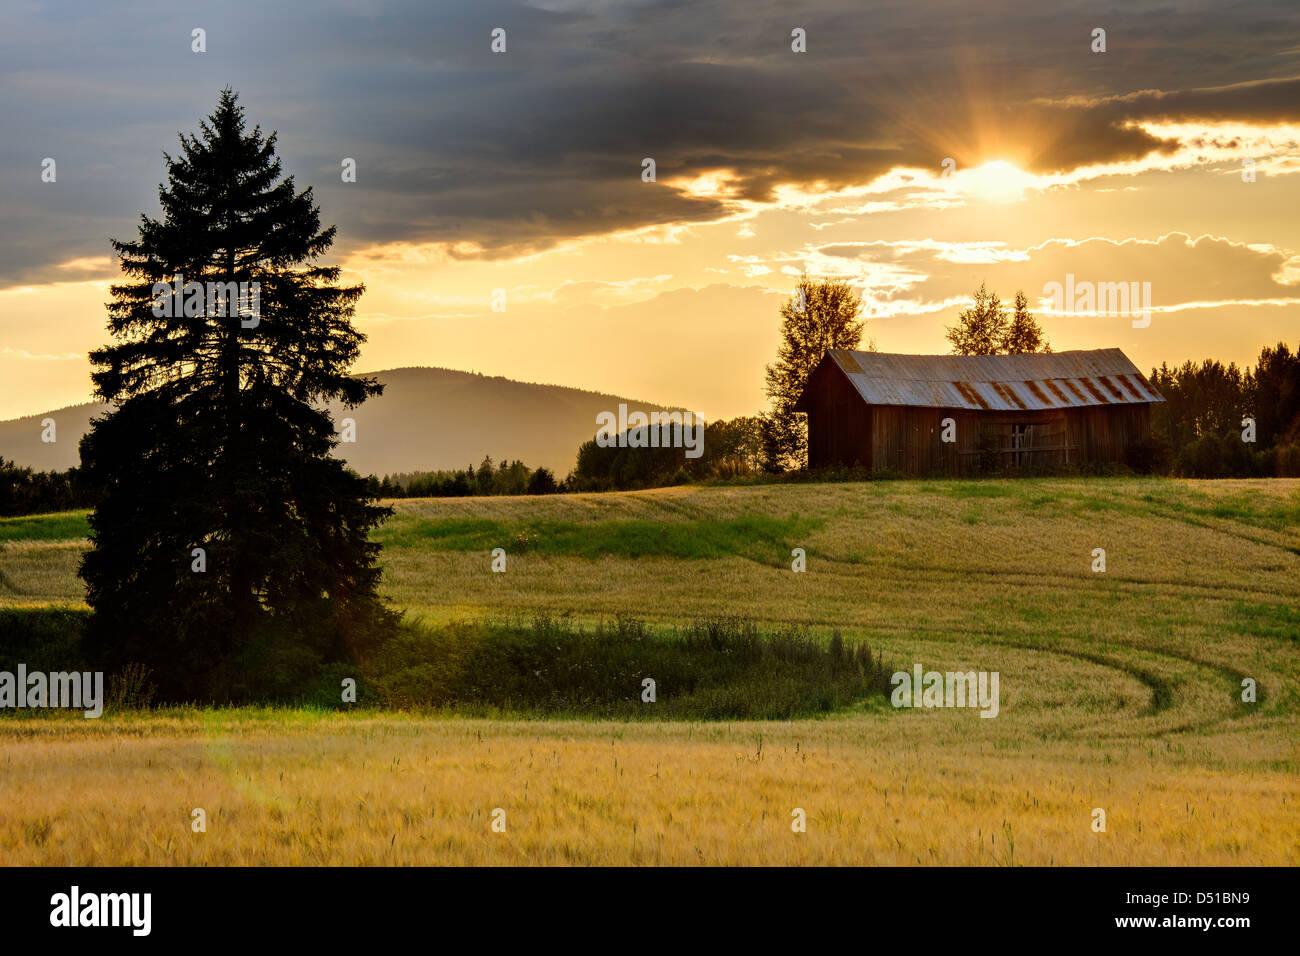 Sunset over farmland, Bollnäs, Hälsingland, Sweden, Europe - Stock Image